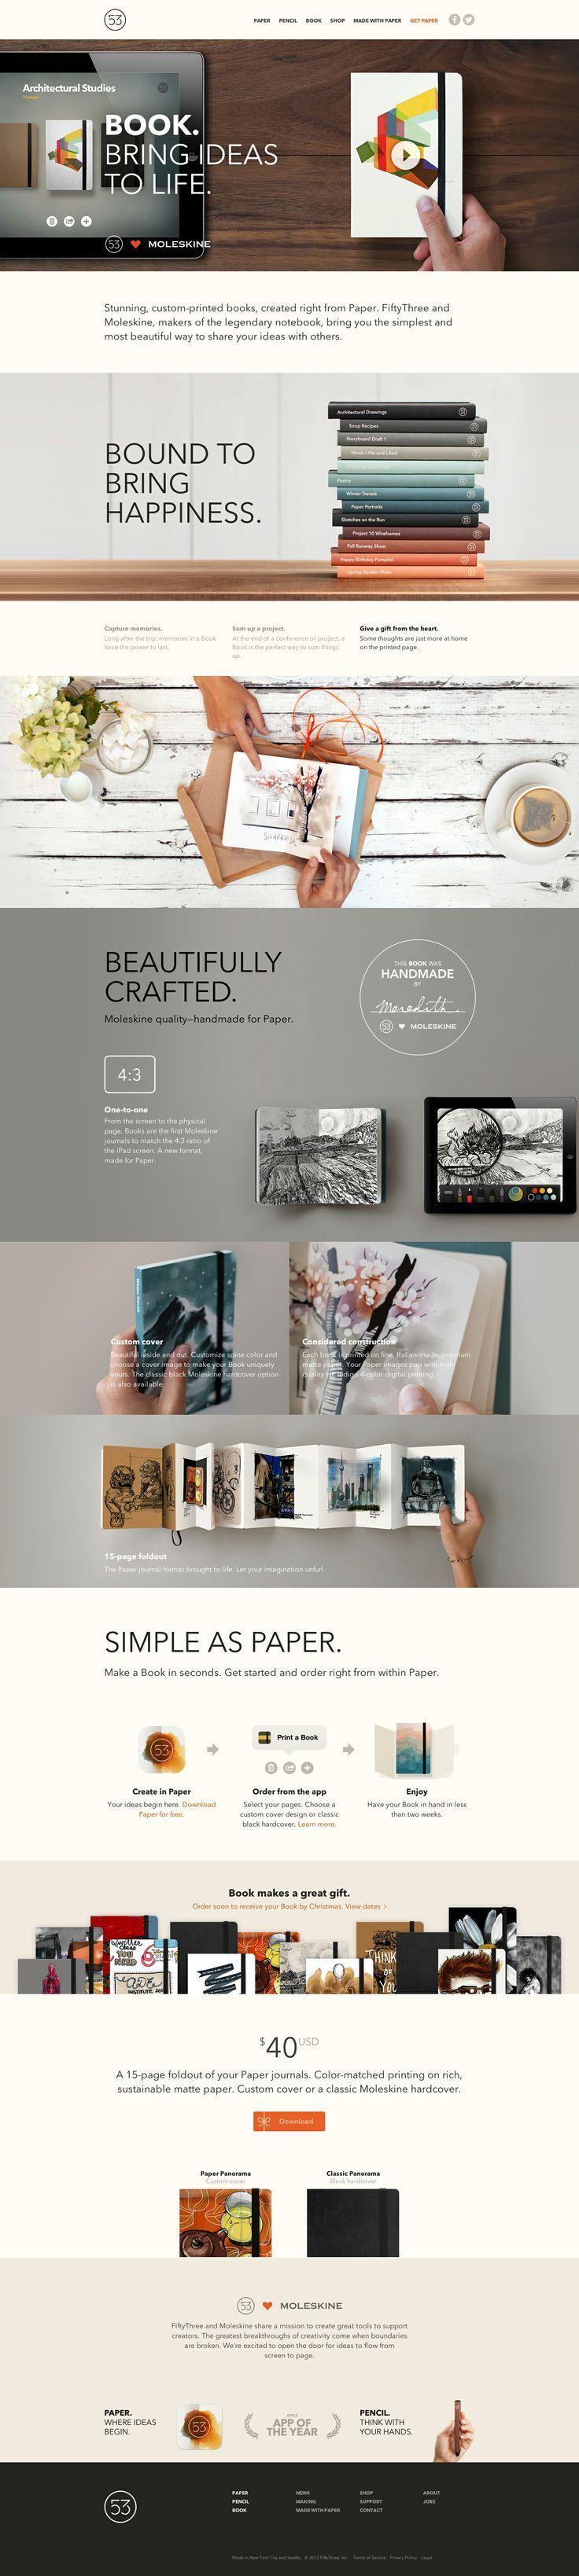 Inspiration | Five Star Branding Agency | Fivestar Design and ...